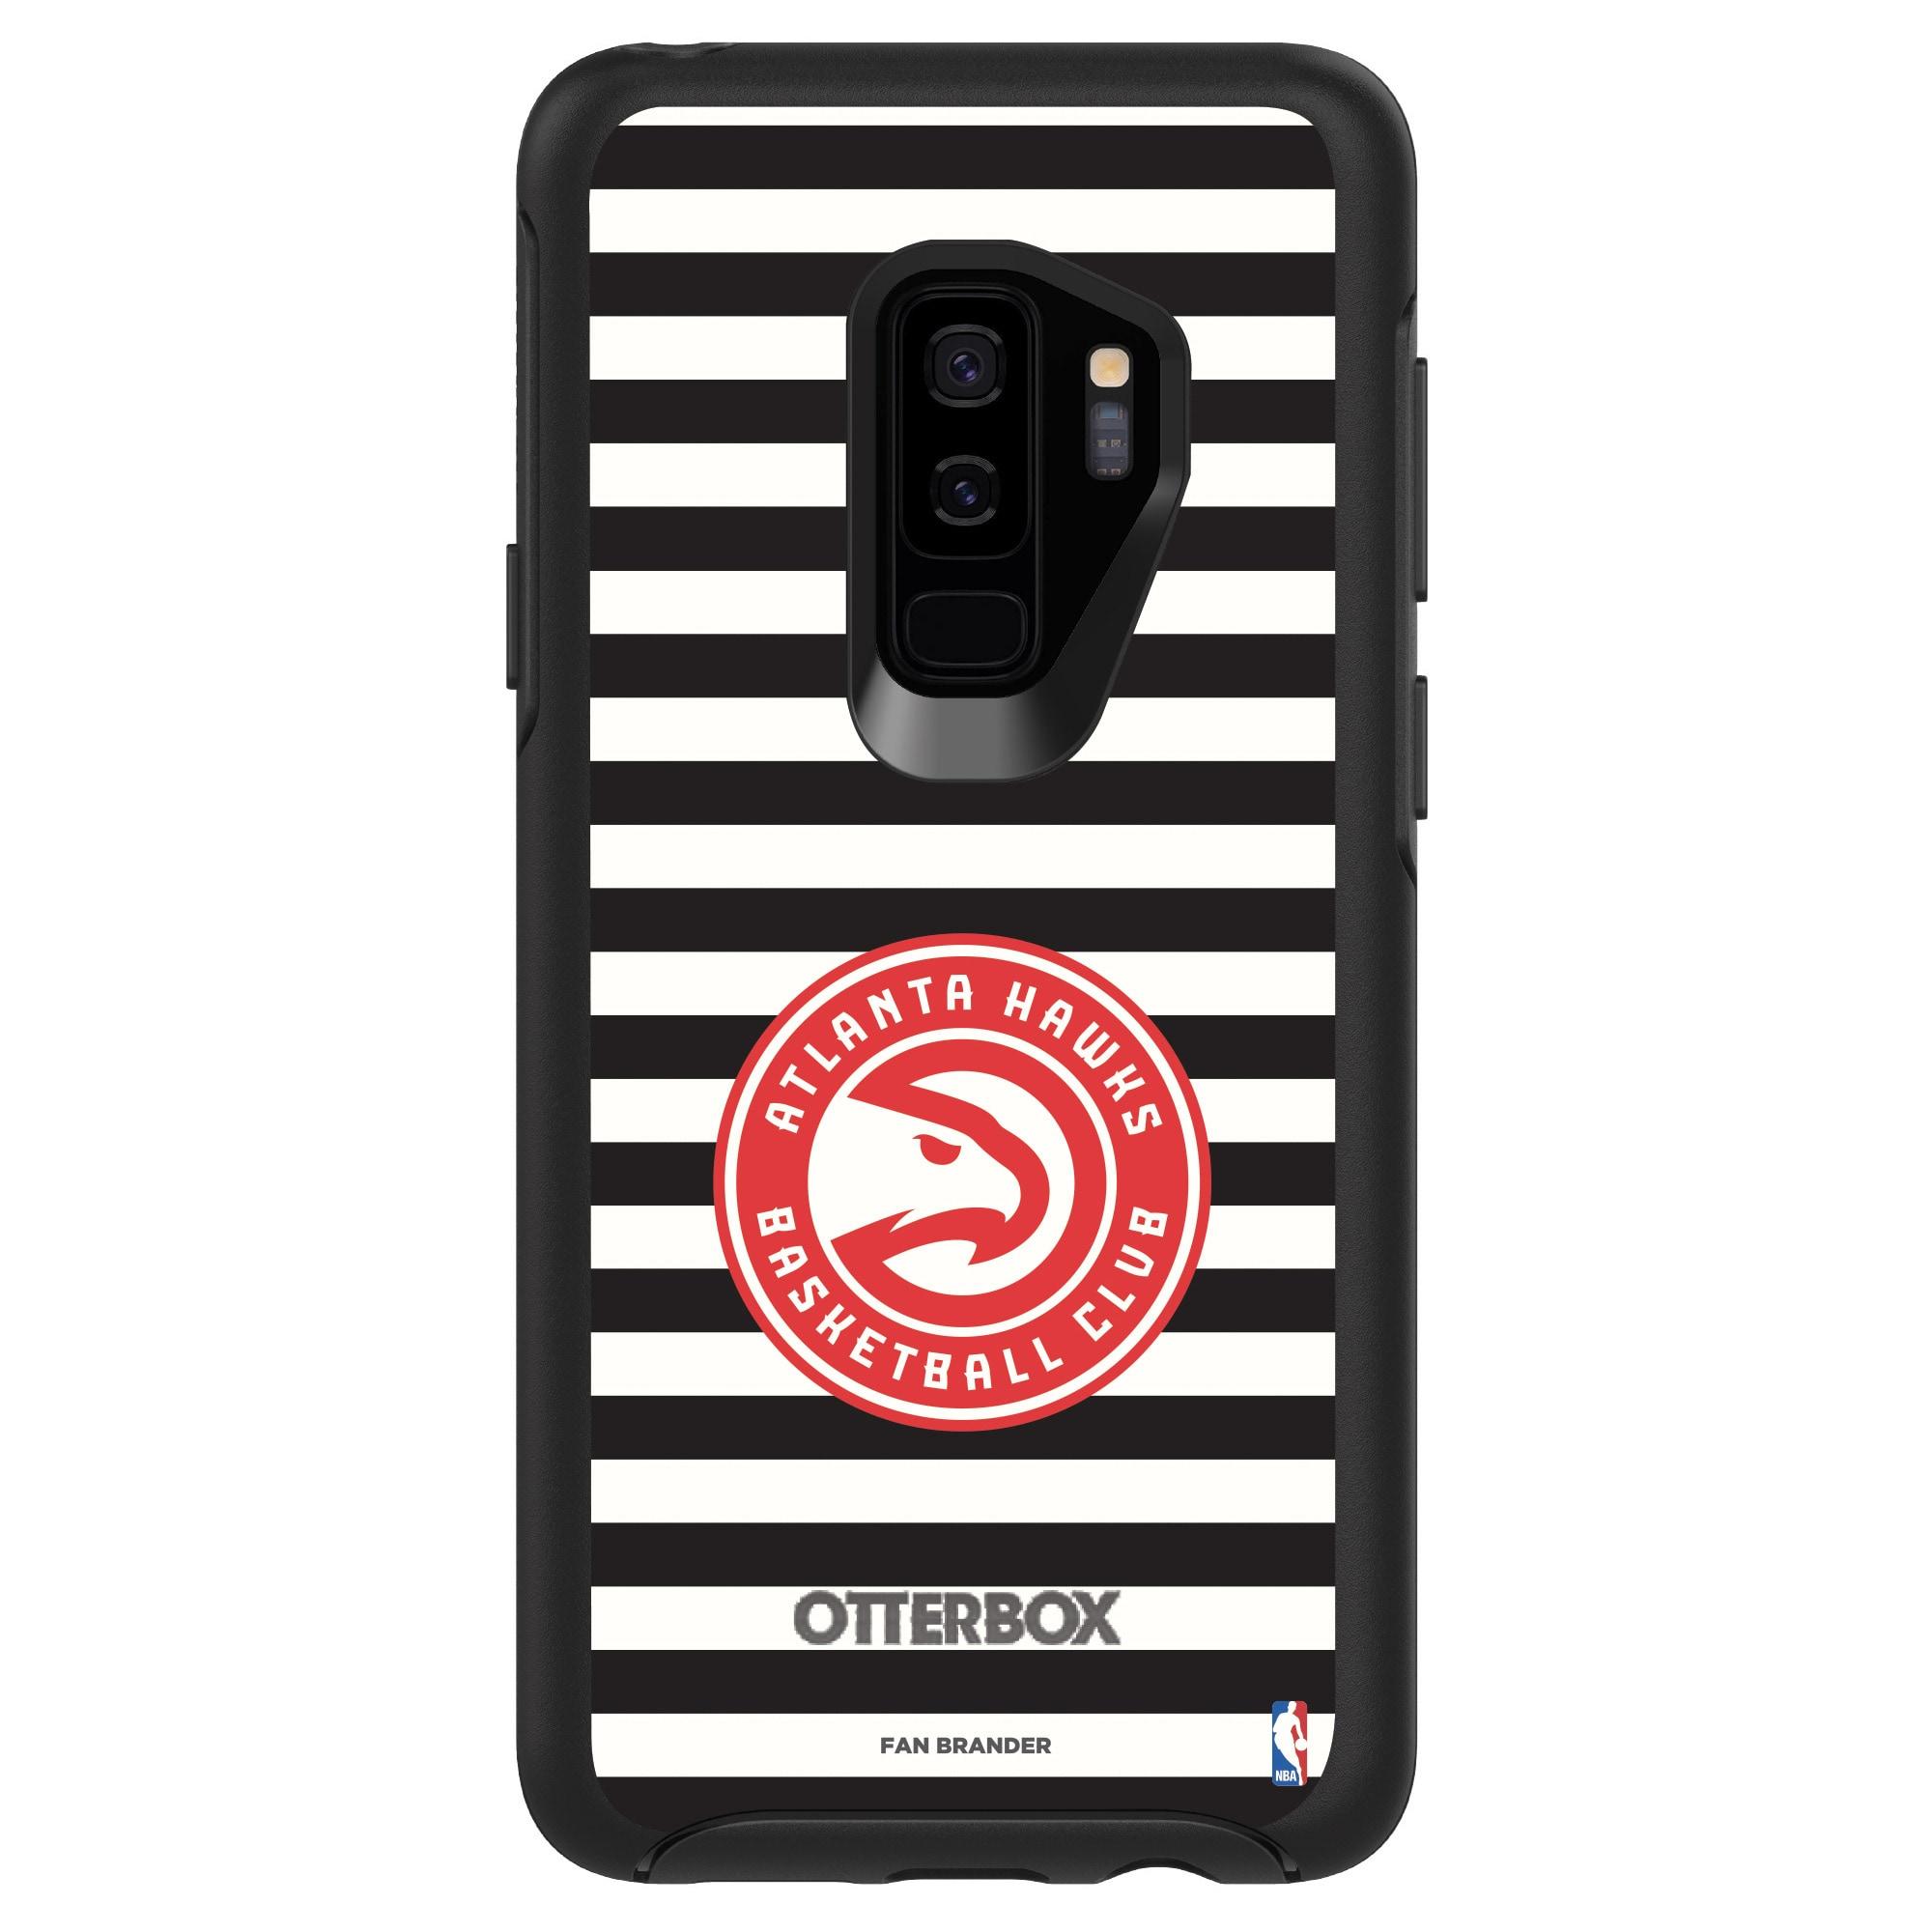 Atlanta Hawks OtterBox Galaxy Symmetry Striped Design Case